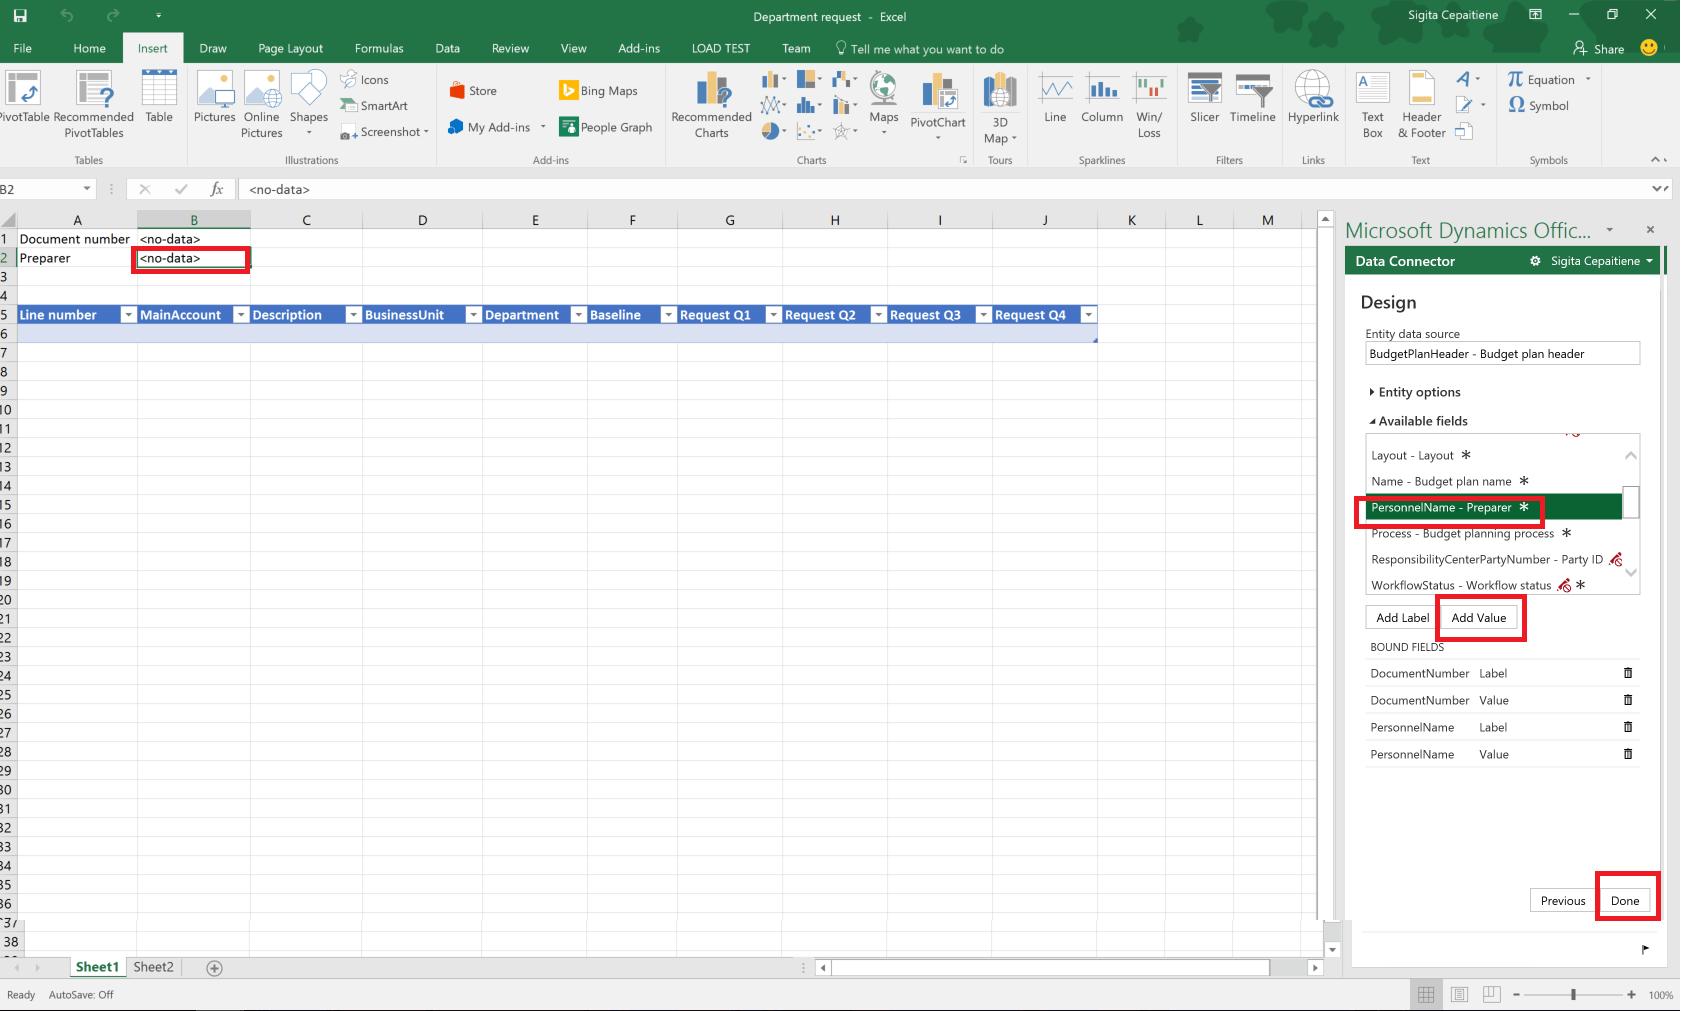 Modelos De Plano De Orcamento Para Excel